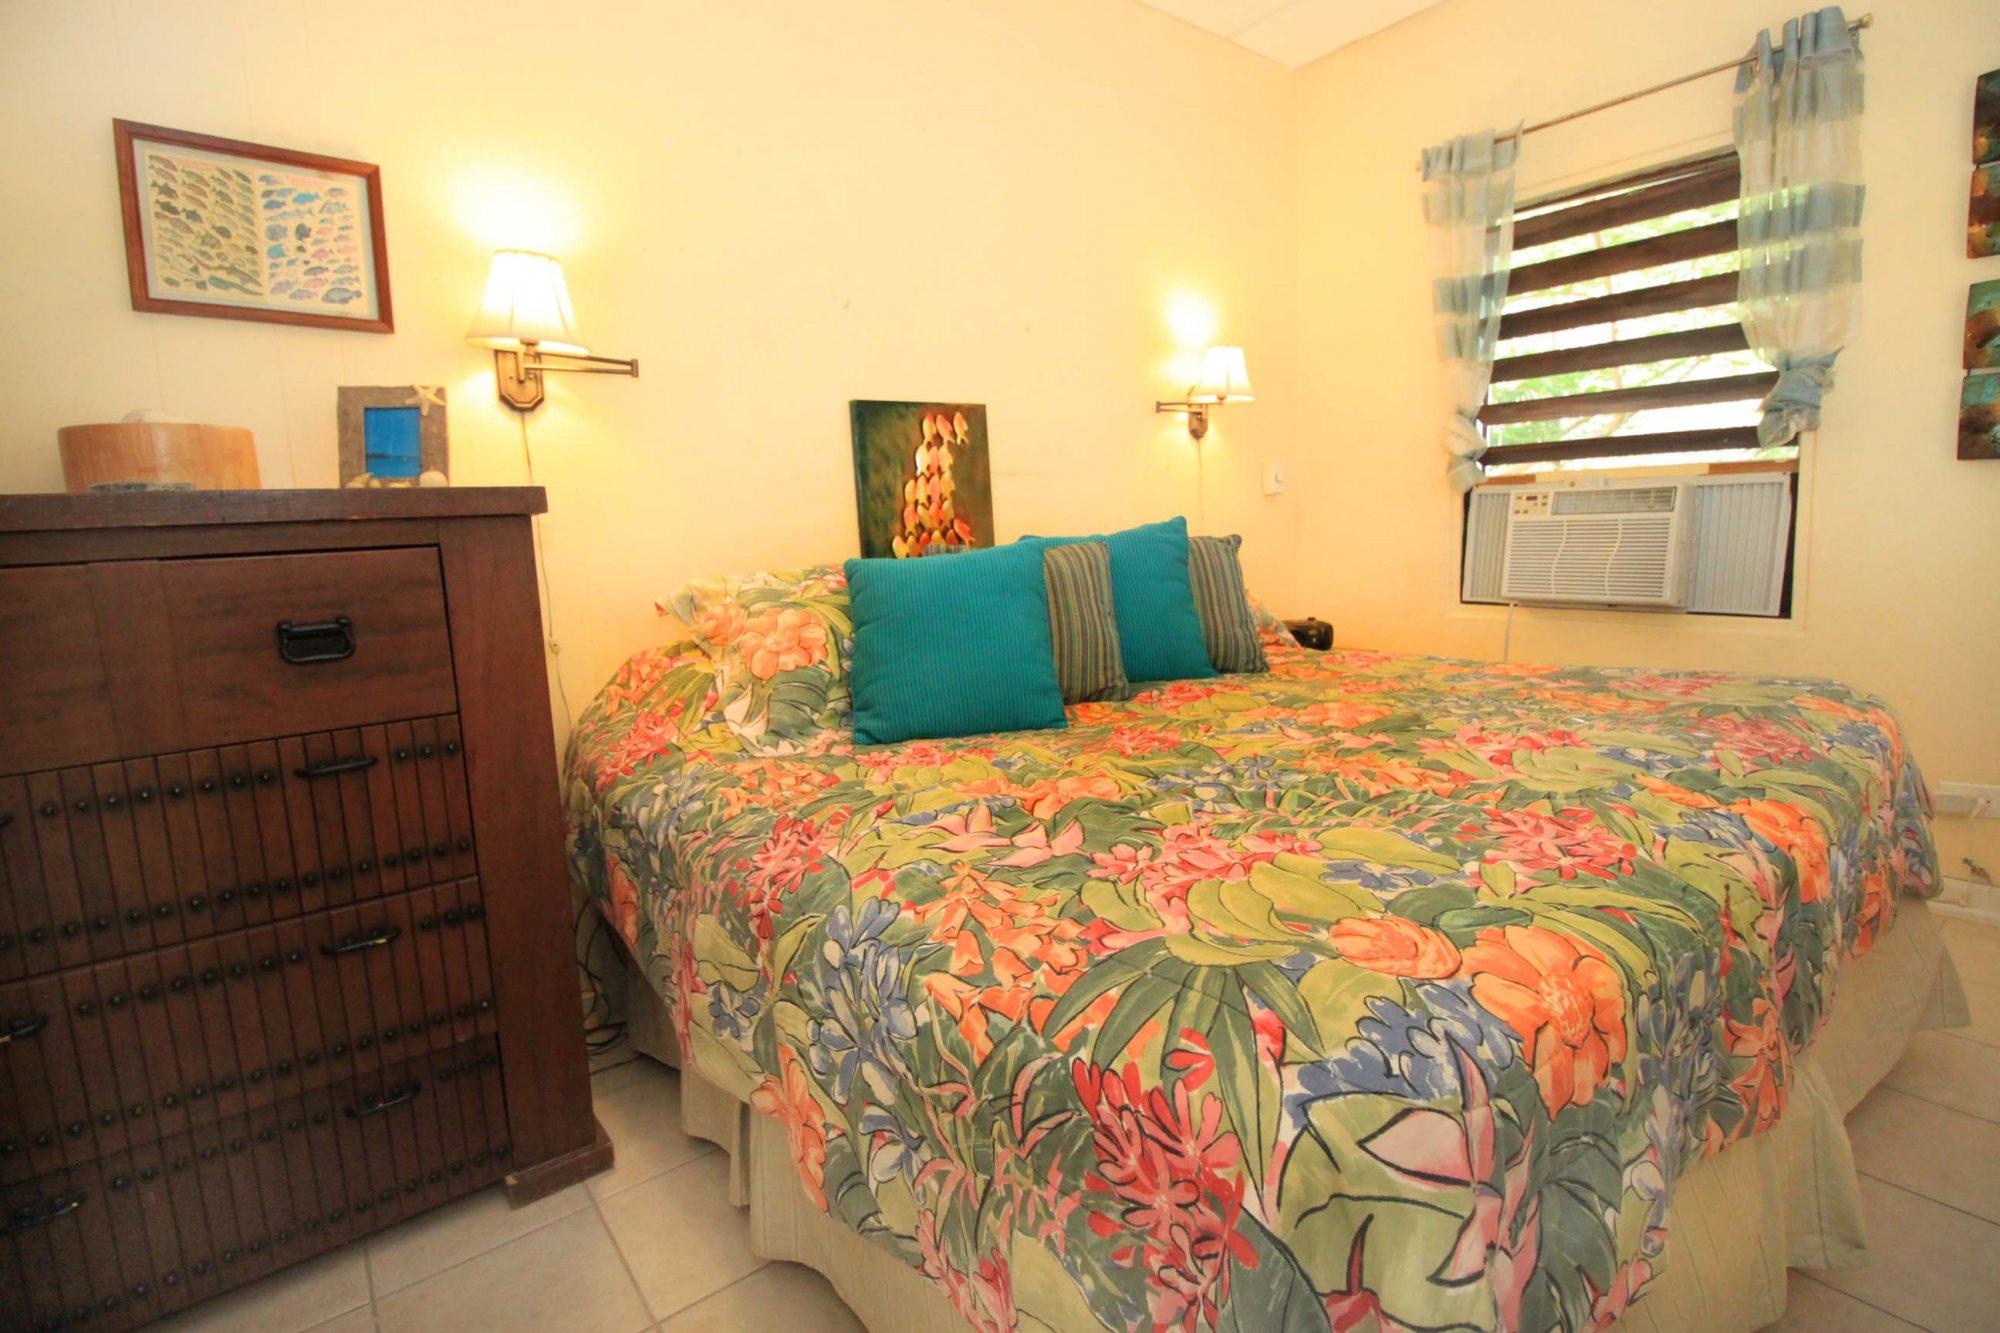 Guest Rooms at Seredip St John Vacation Condominiums in St. John, VI